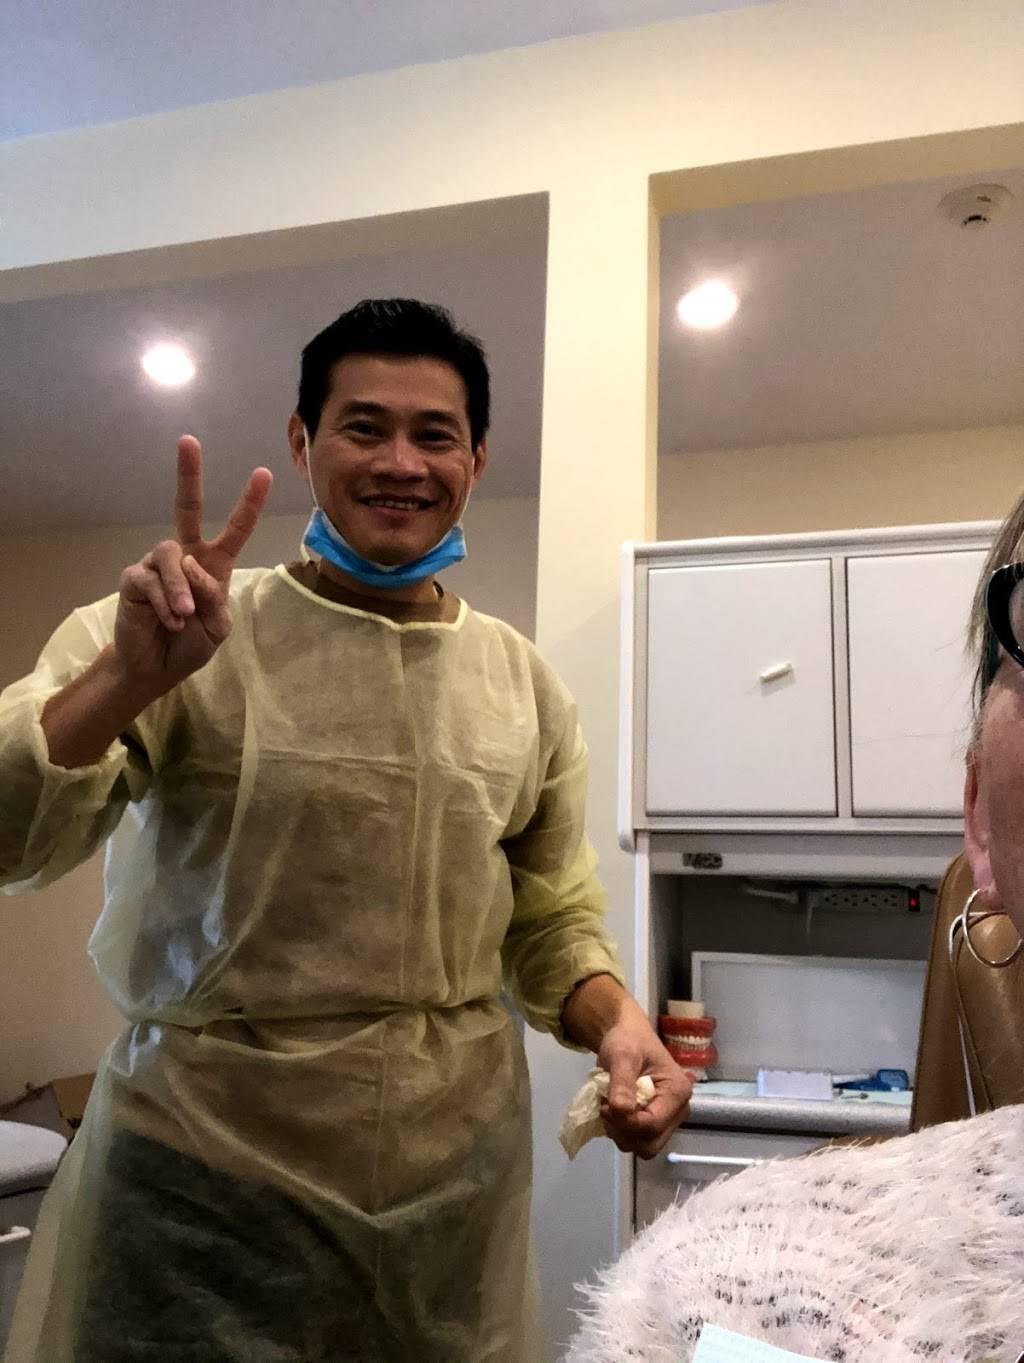 Tran Quan L DDS - dentist  | Photo 2 of 2 | Address: 242 Everett Ave, Chelsea, MA 02150, USA | Phone: (617) 884-0165